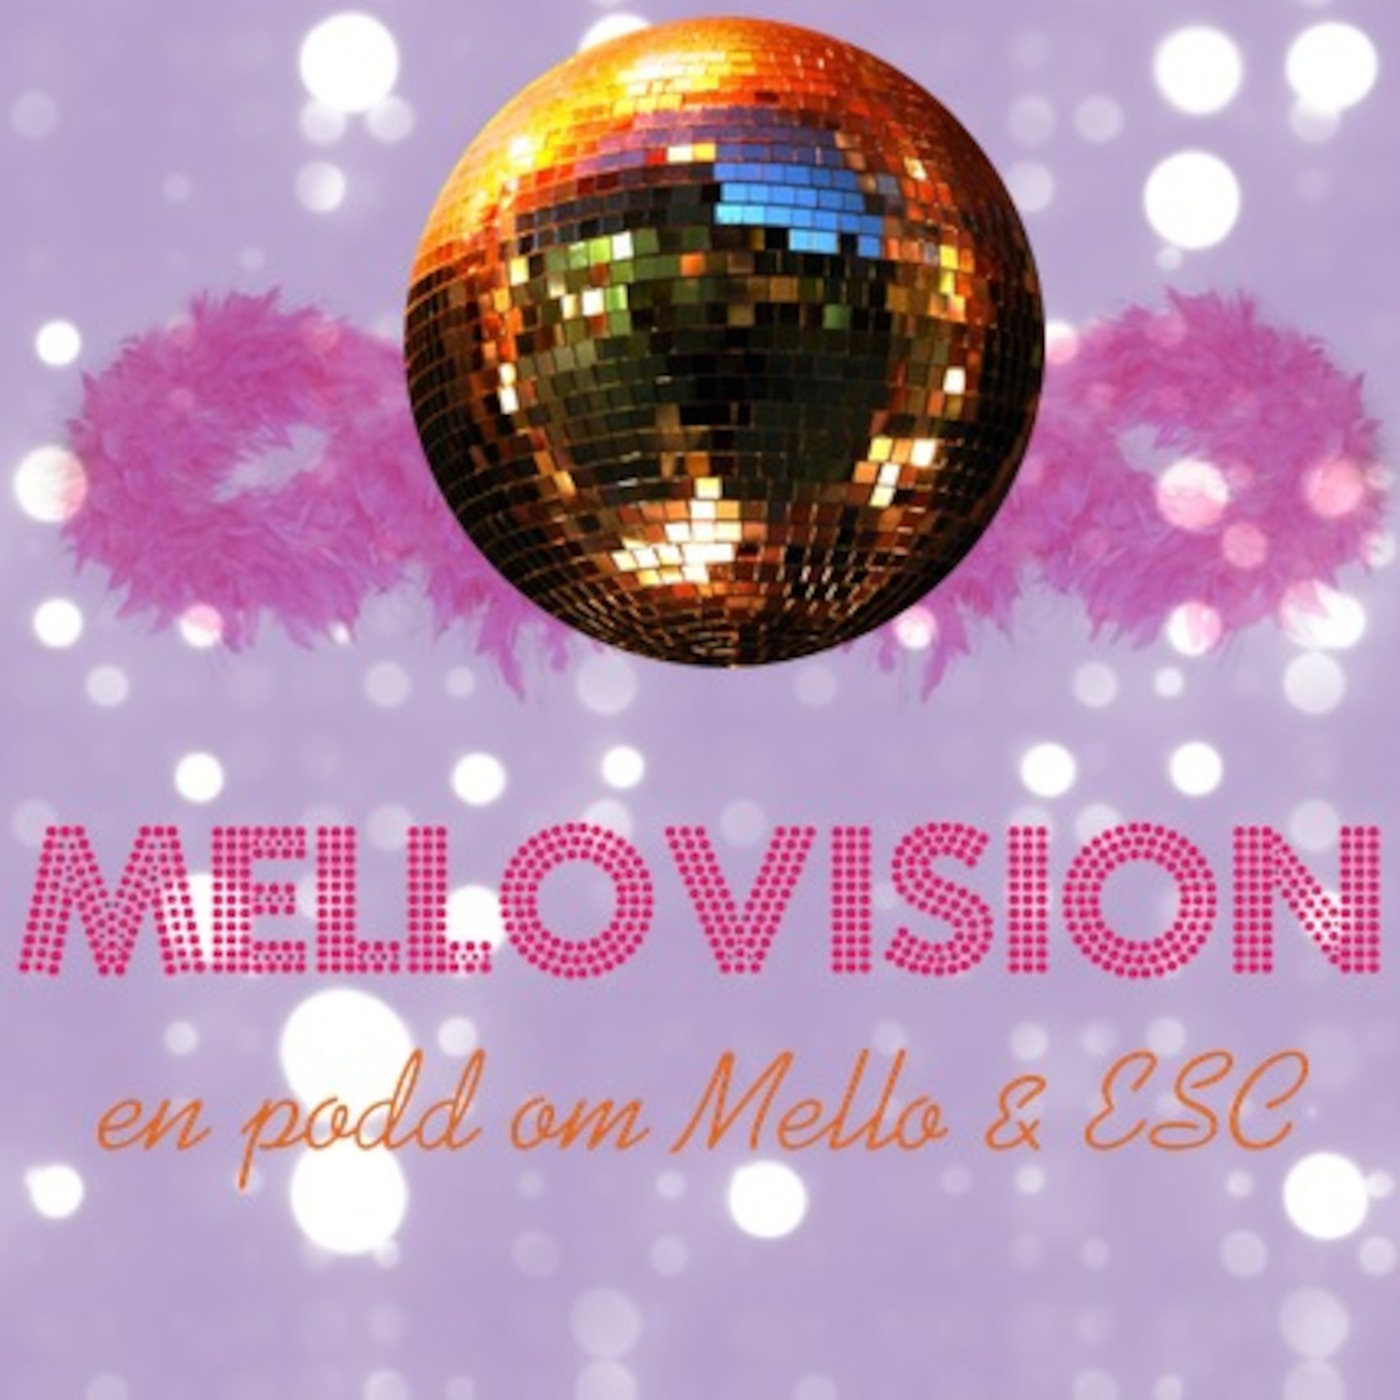 Mellovision